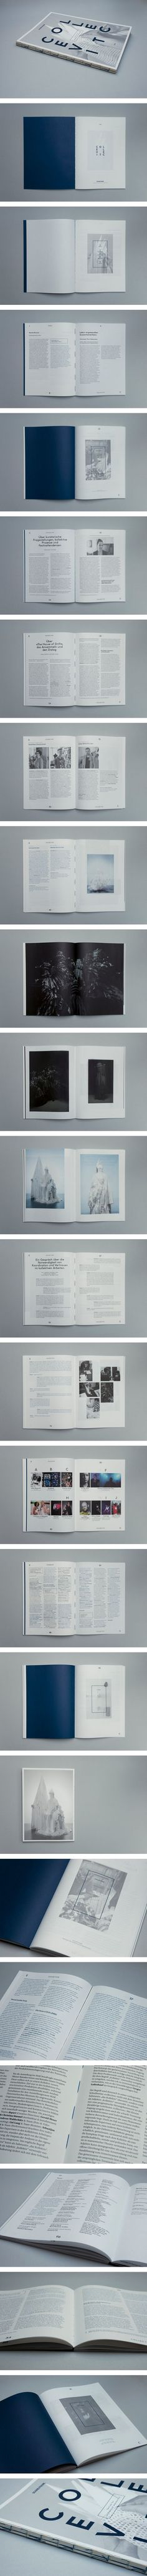 SOUND:FRAME 2013 Catalog by Maximilian Huber